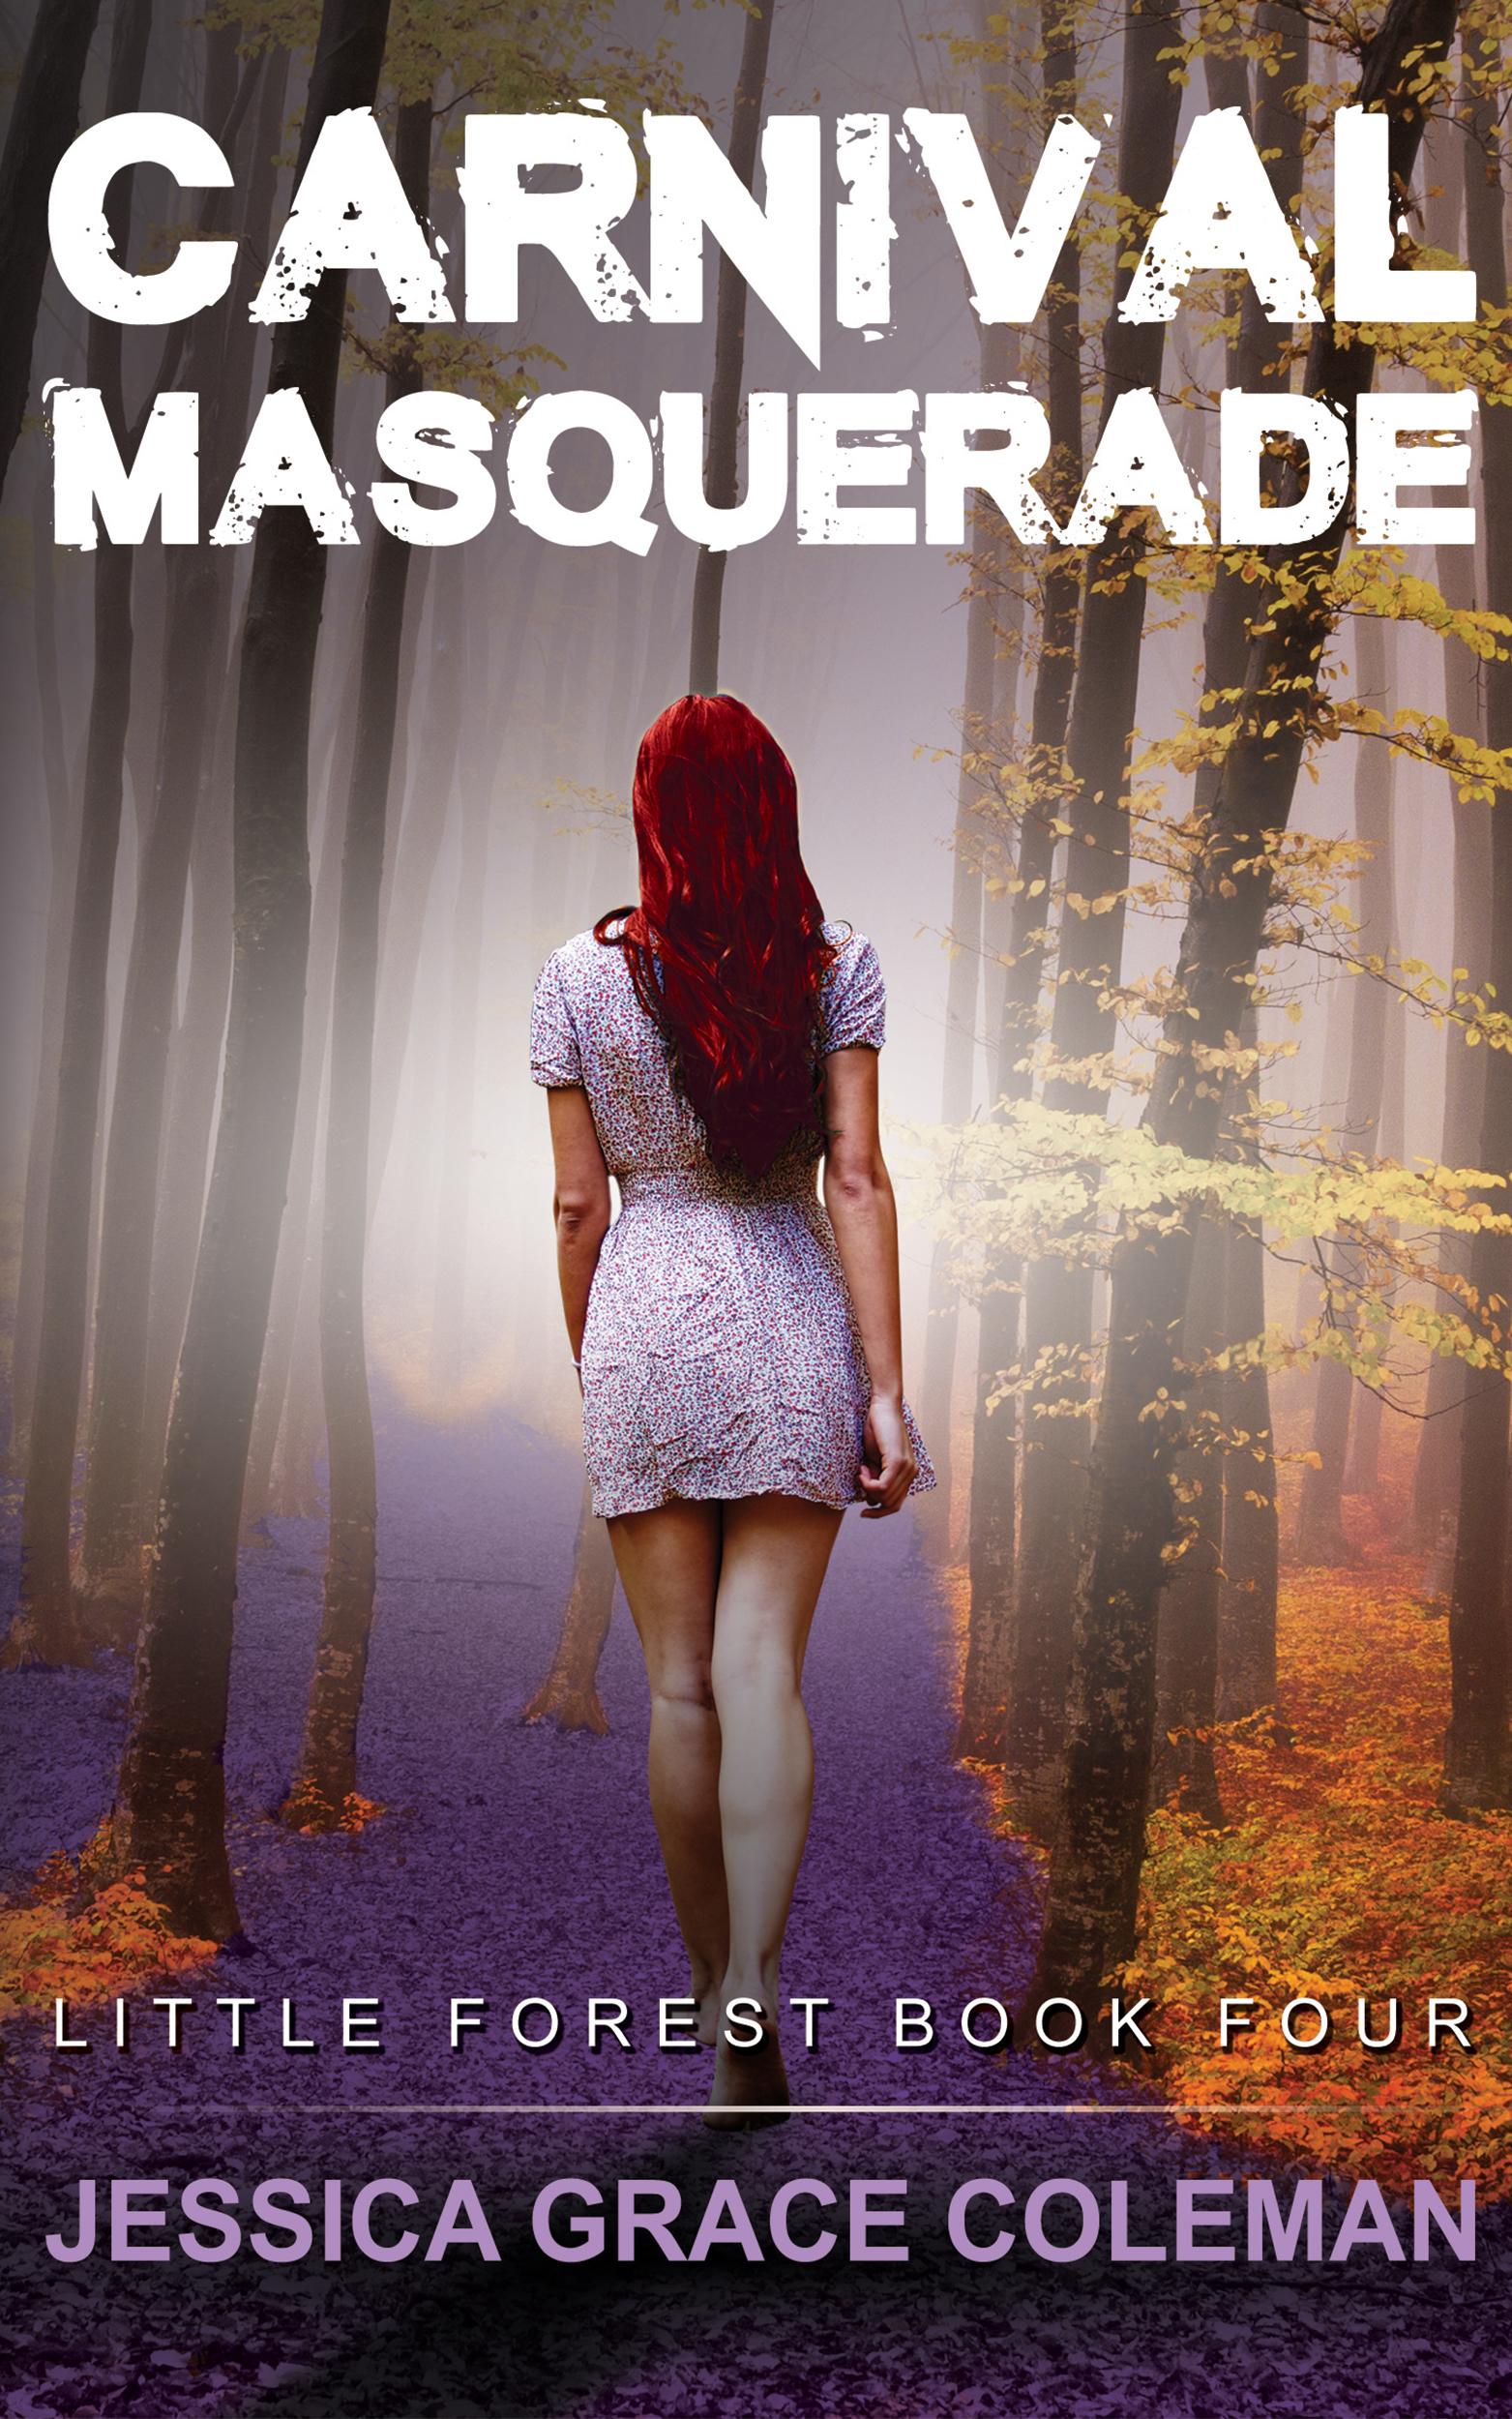 Carnival Masquerade by Jessica Grace Coleman